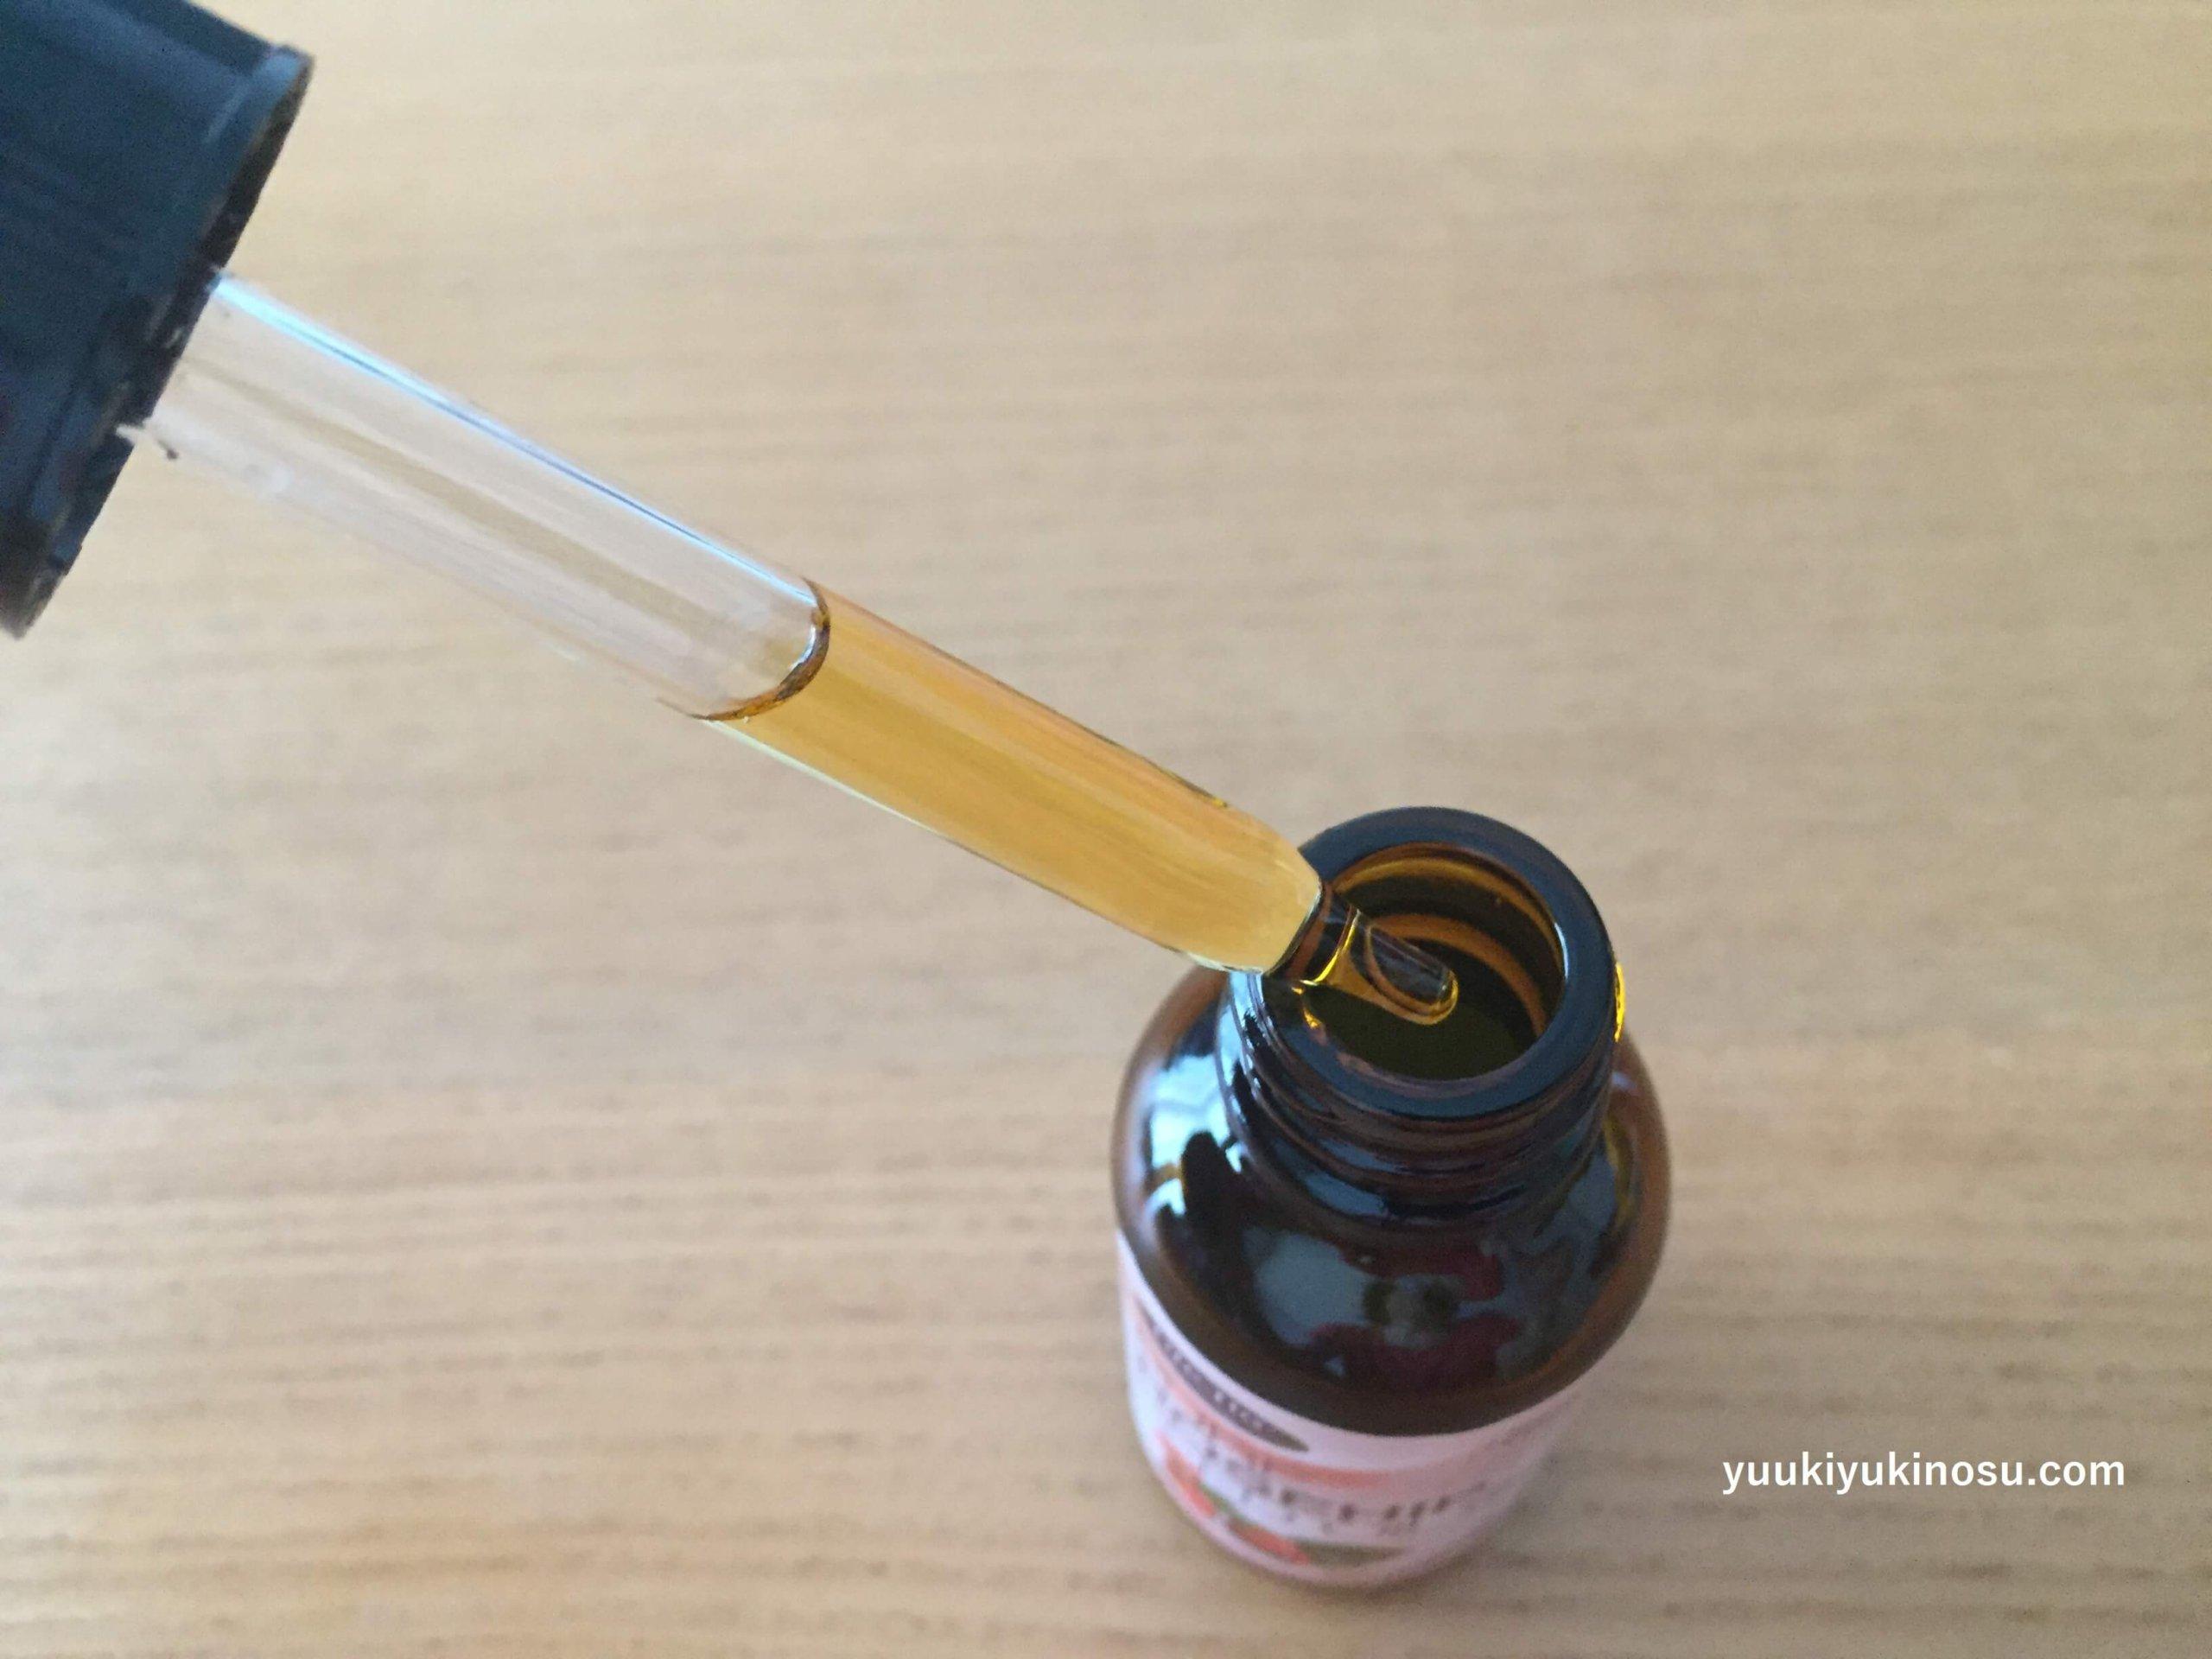 iHerb アイハーブ ローズヒップシードオイル 効果 使い方 ニキビ 酸化 毛穴 スキンケア 香り 光毒性